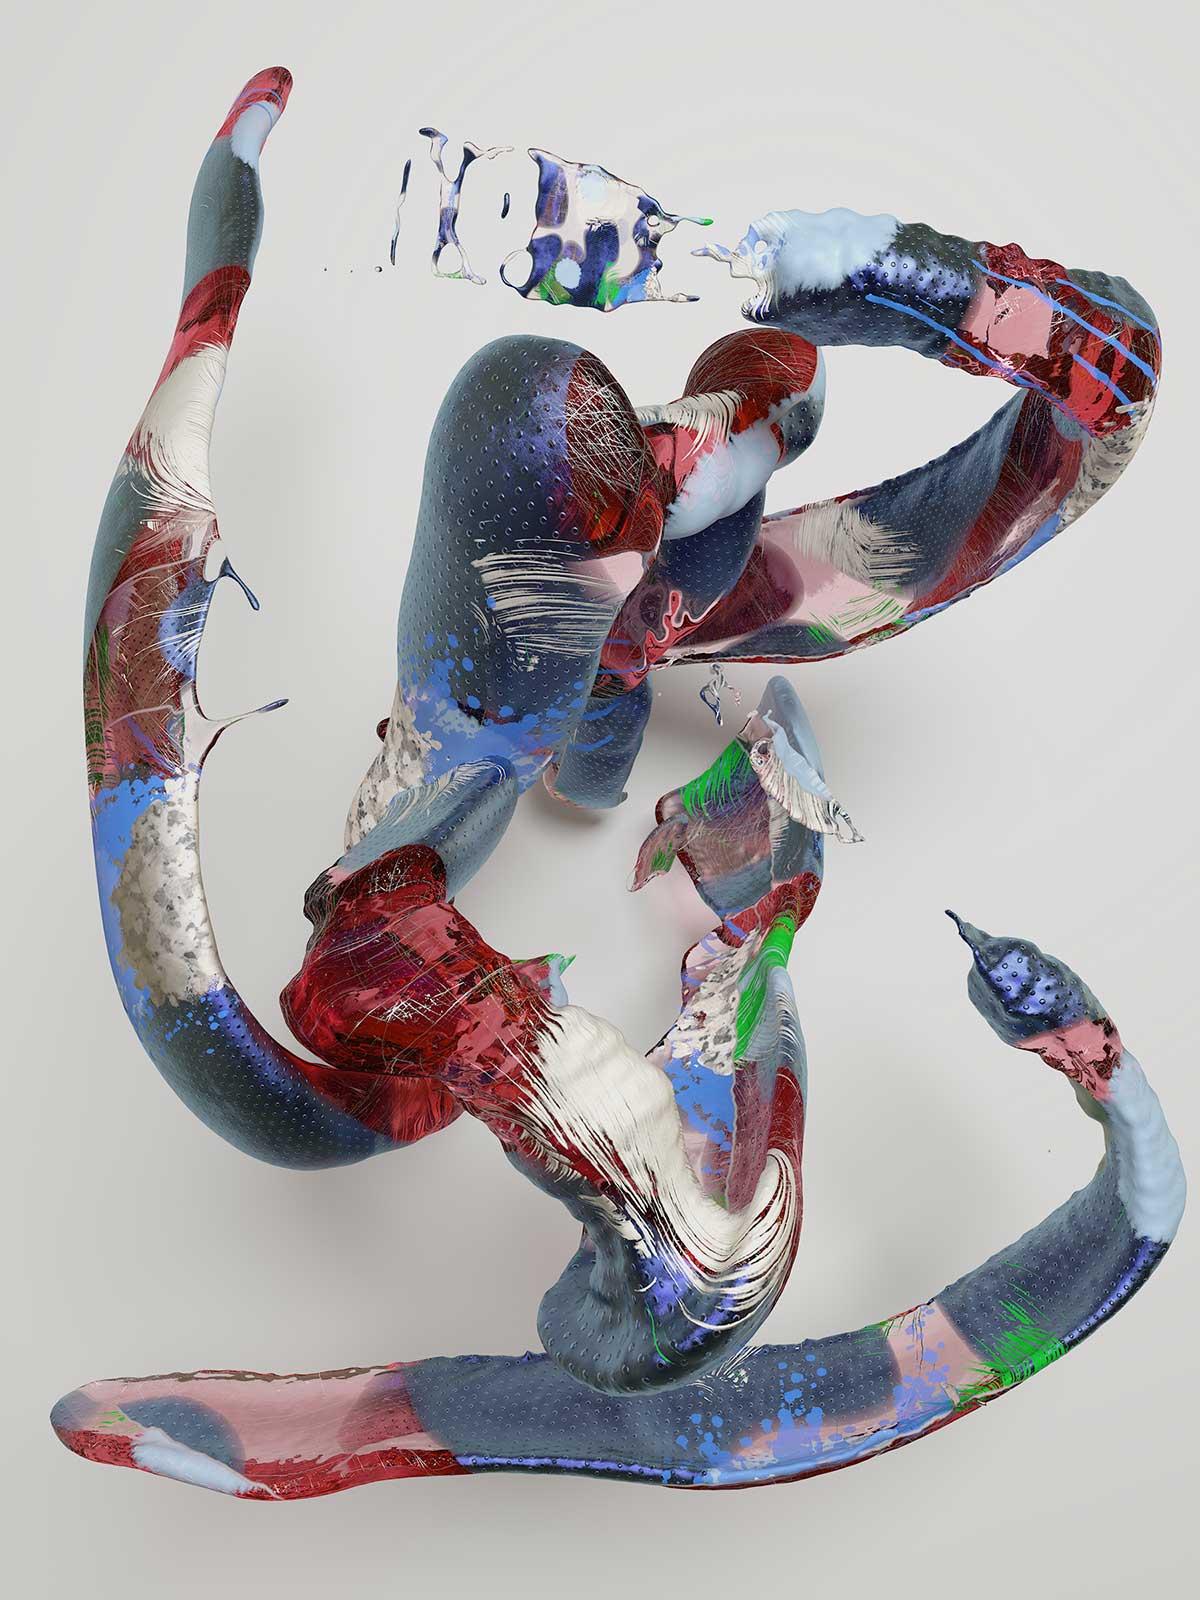 Substance I 08, CGI Fine Art Print, 140 x 105 cm, 2017